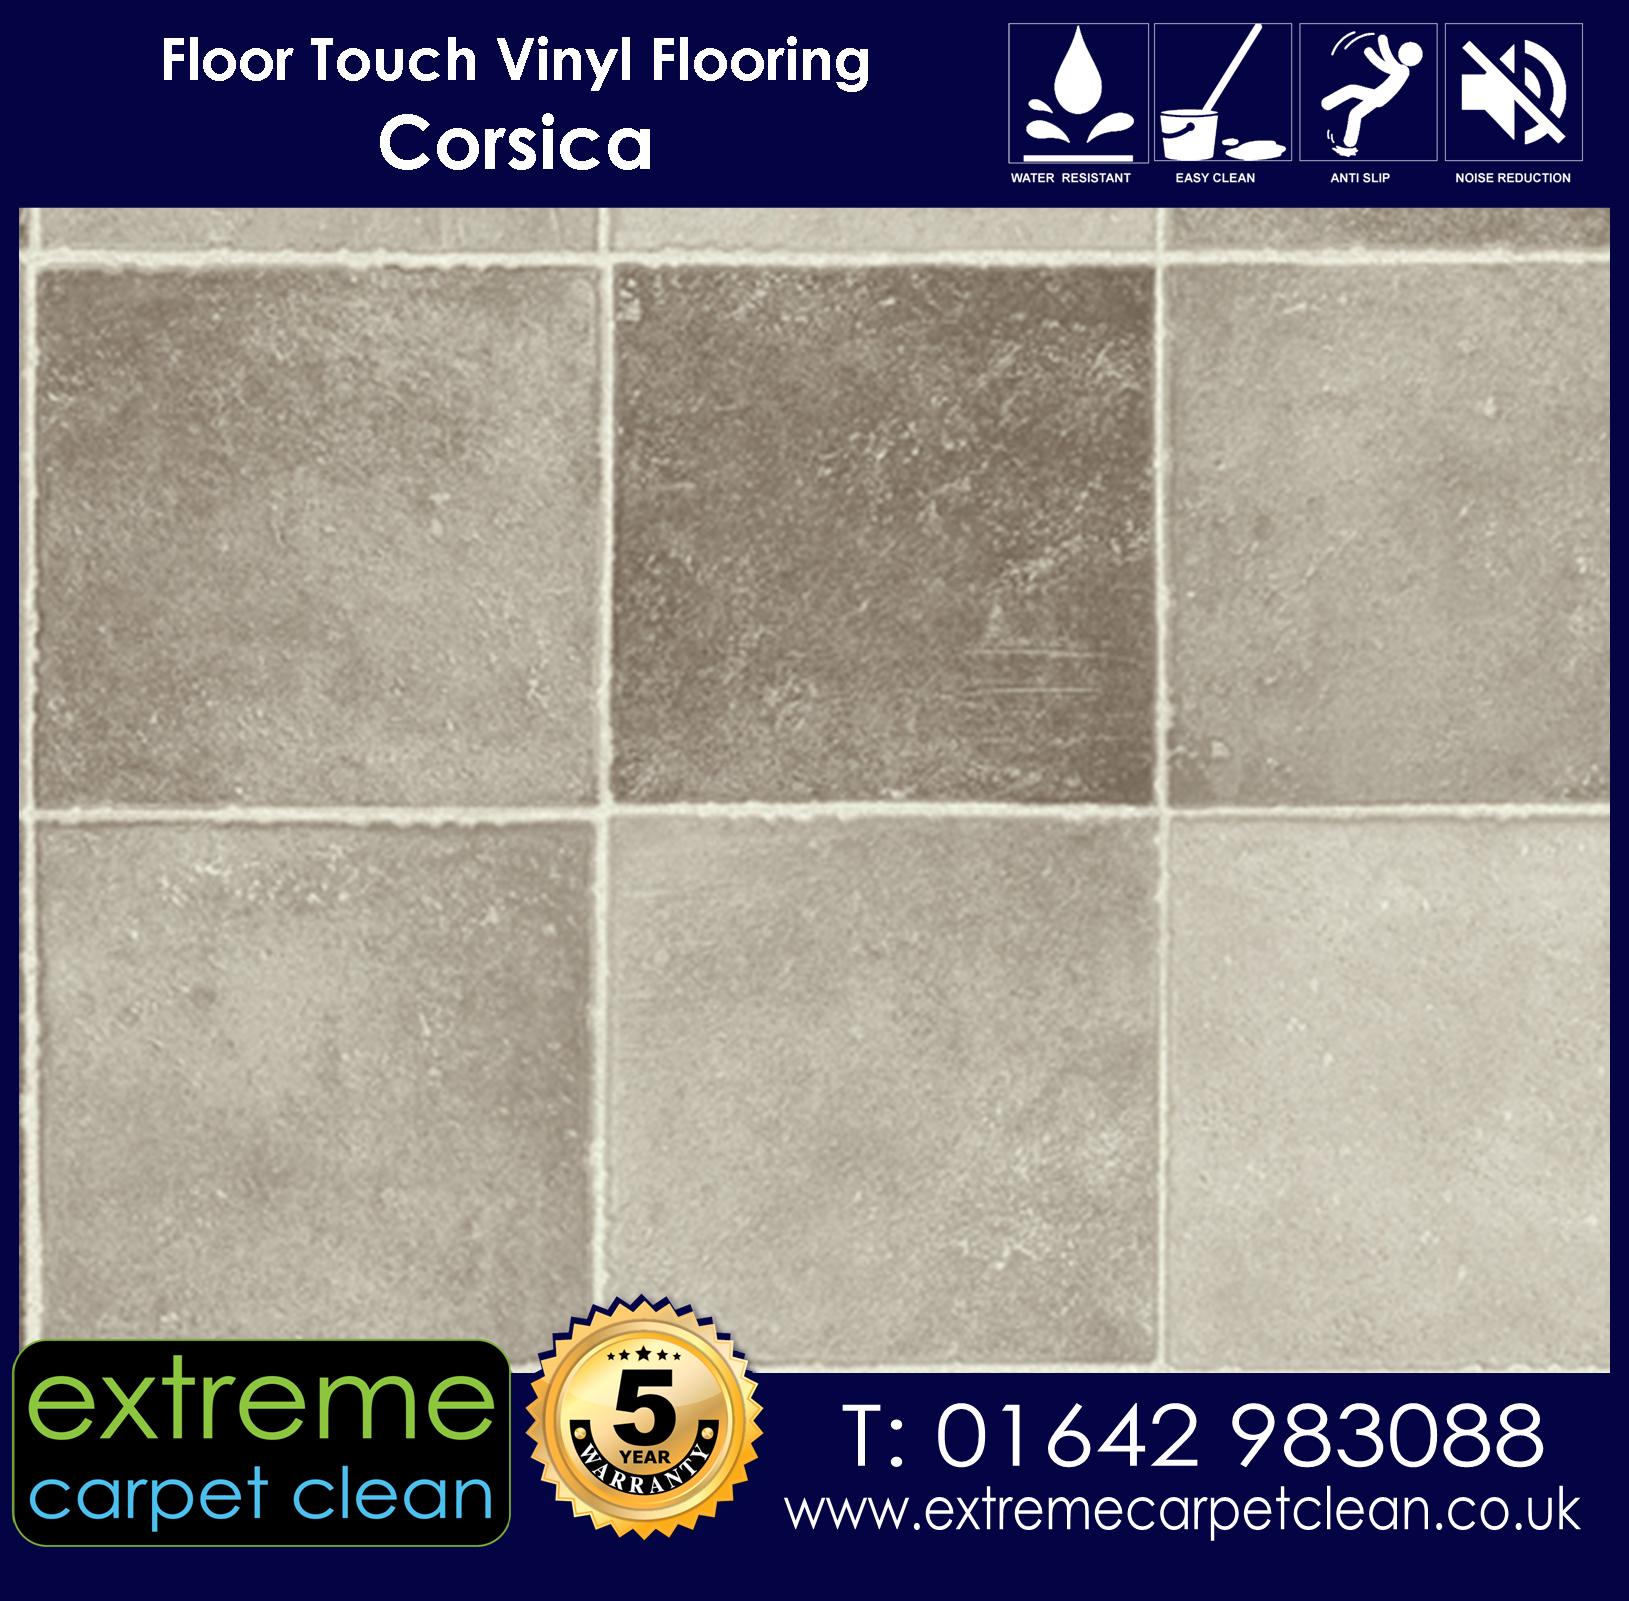 Extreme Carpet Clean. Vinyl Flooring. Corsica